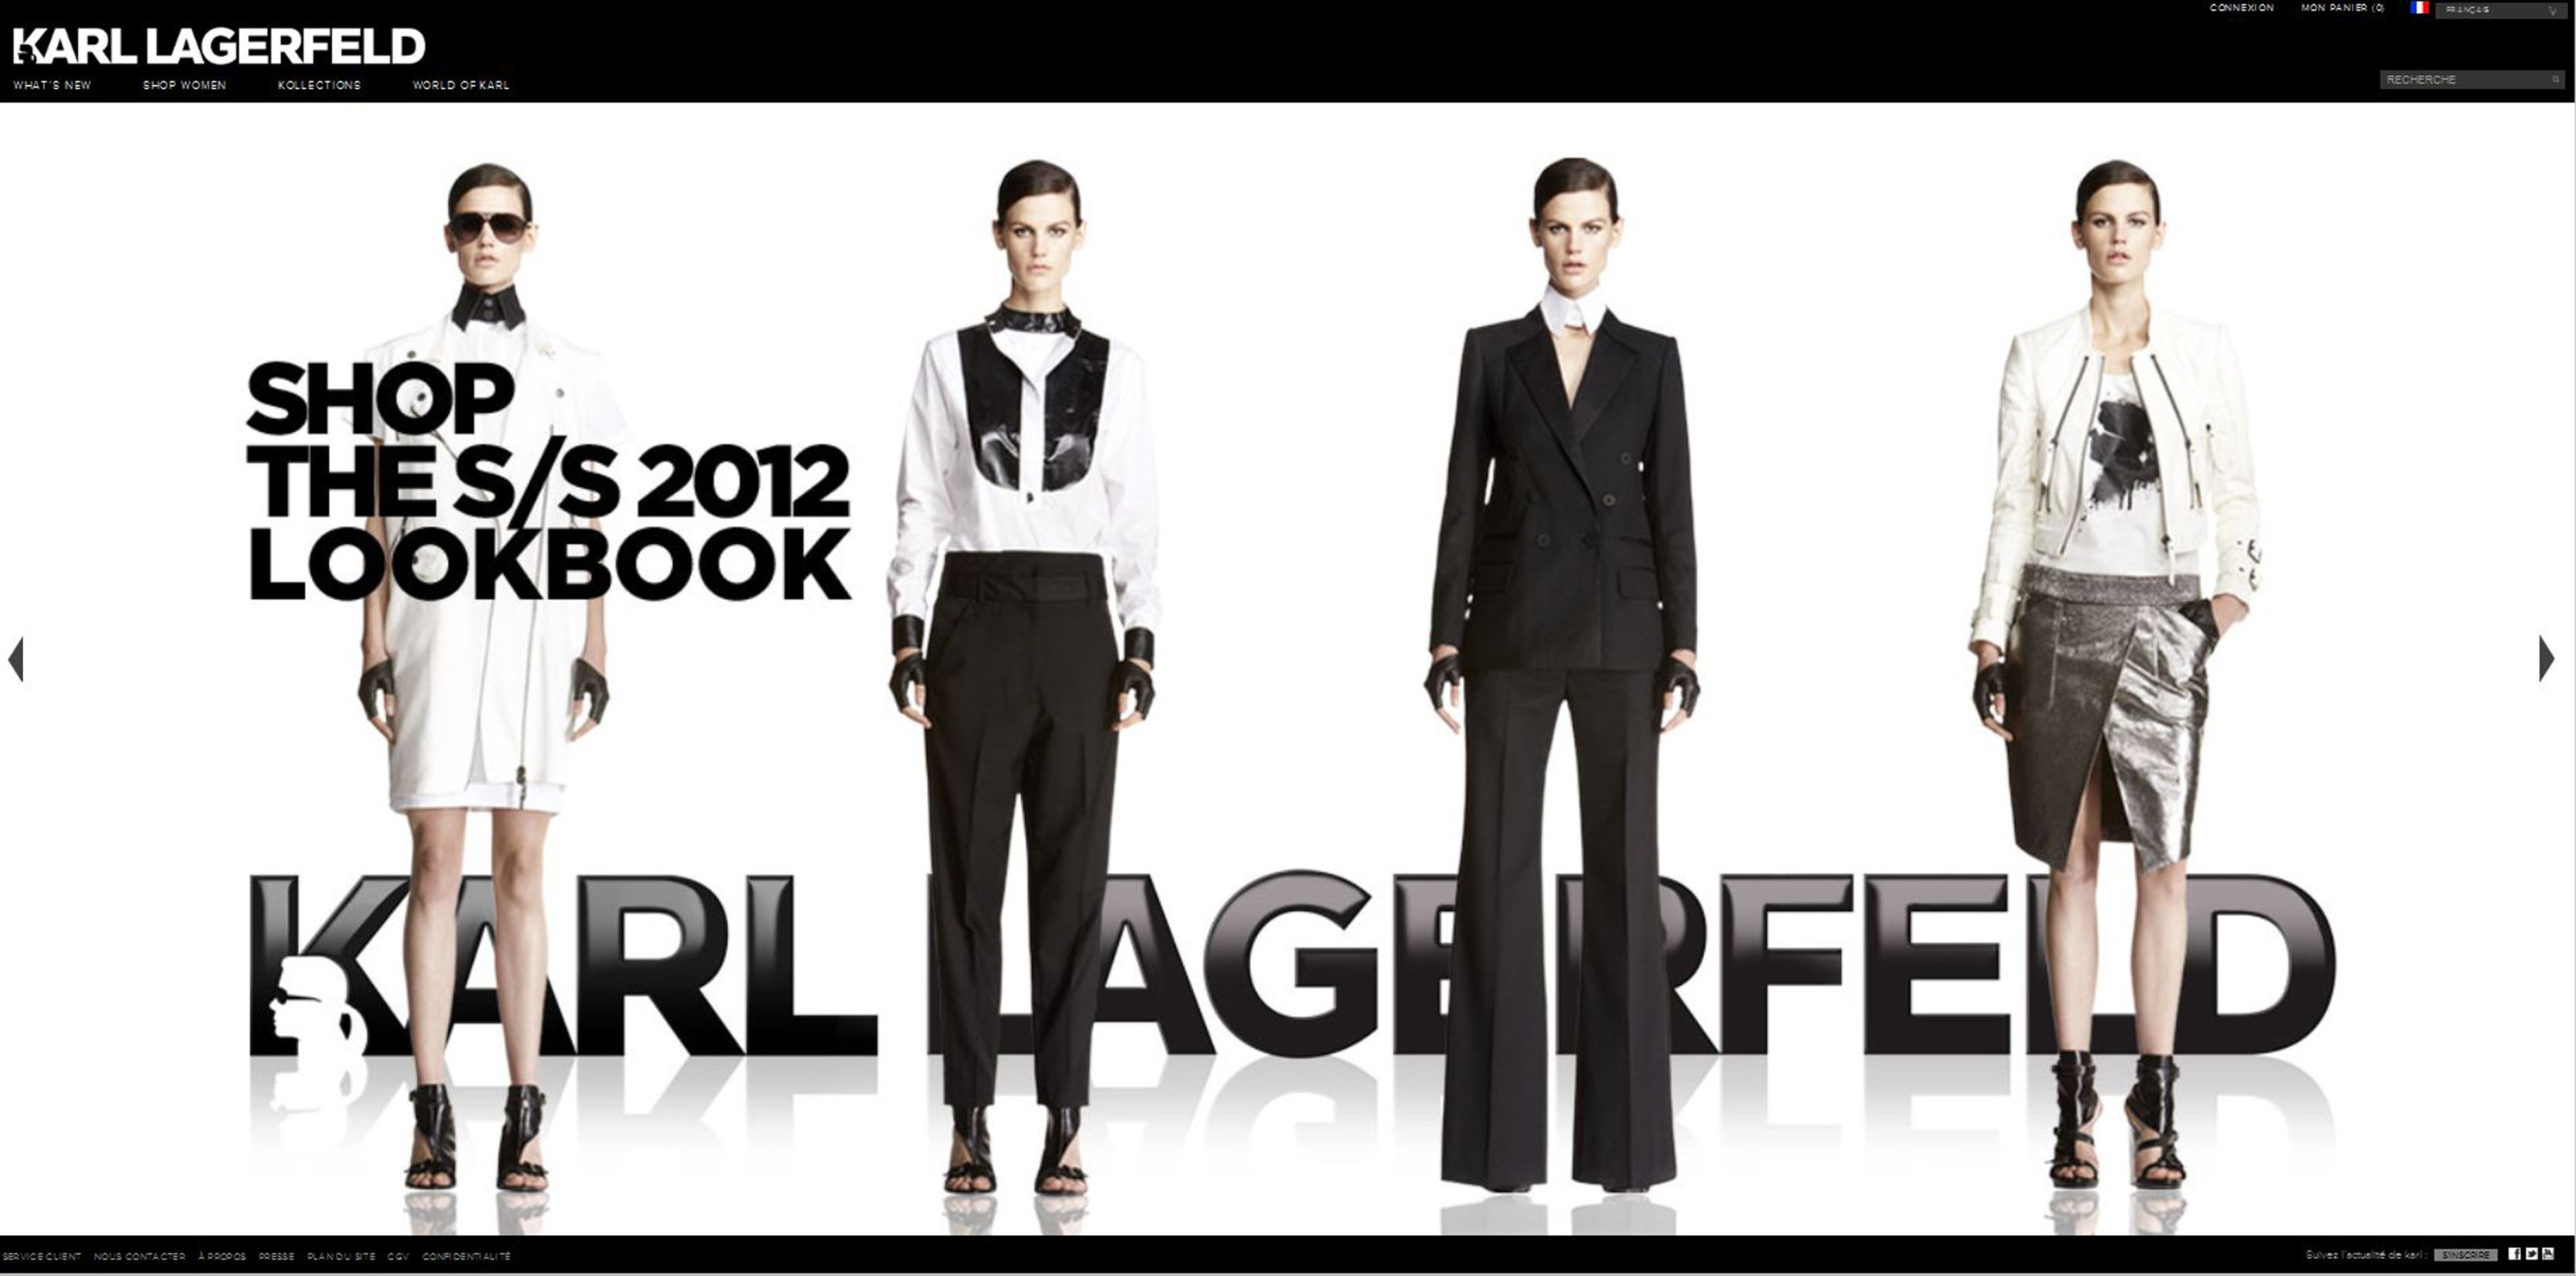 karl lagerfeld fashion house. Black Bedroom Furniture Sets. Home Design Ideas